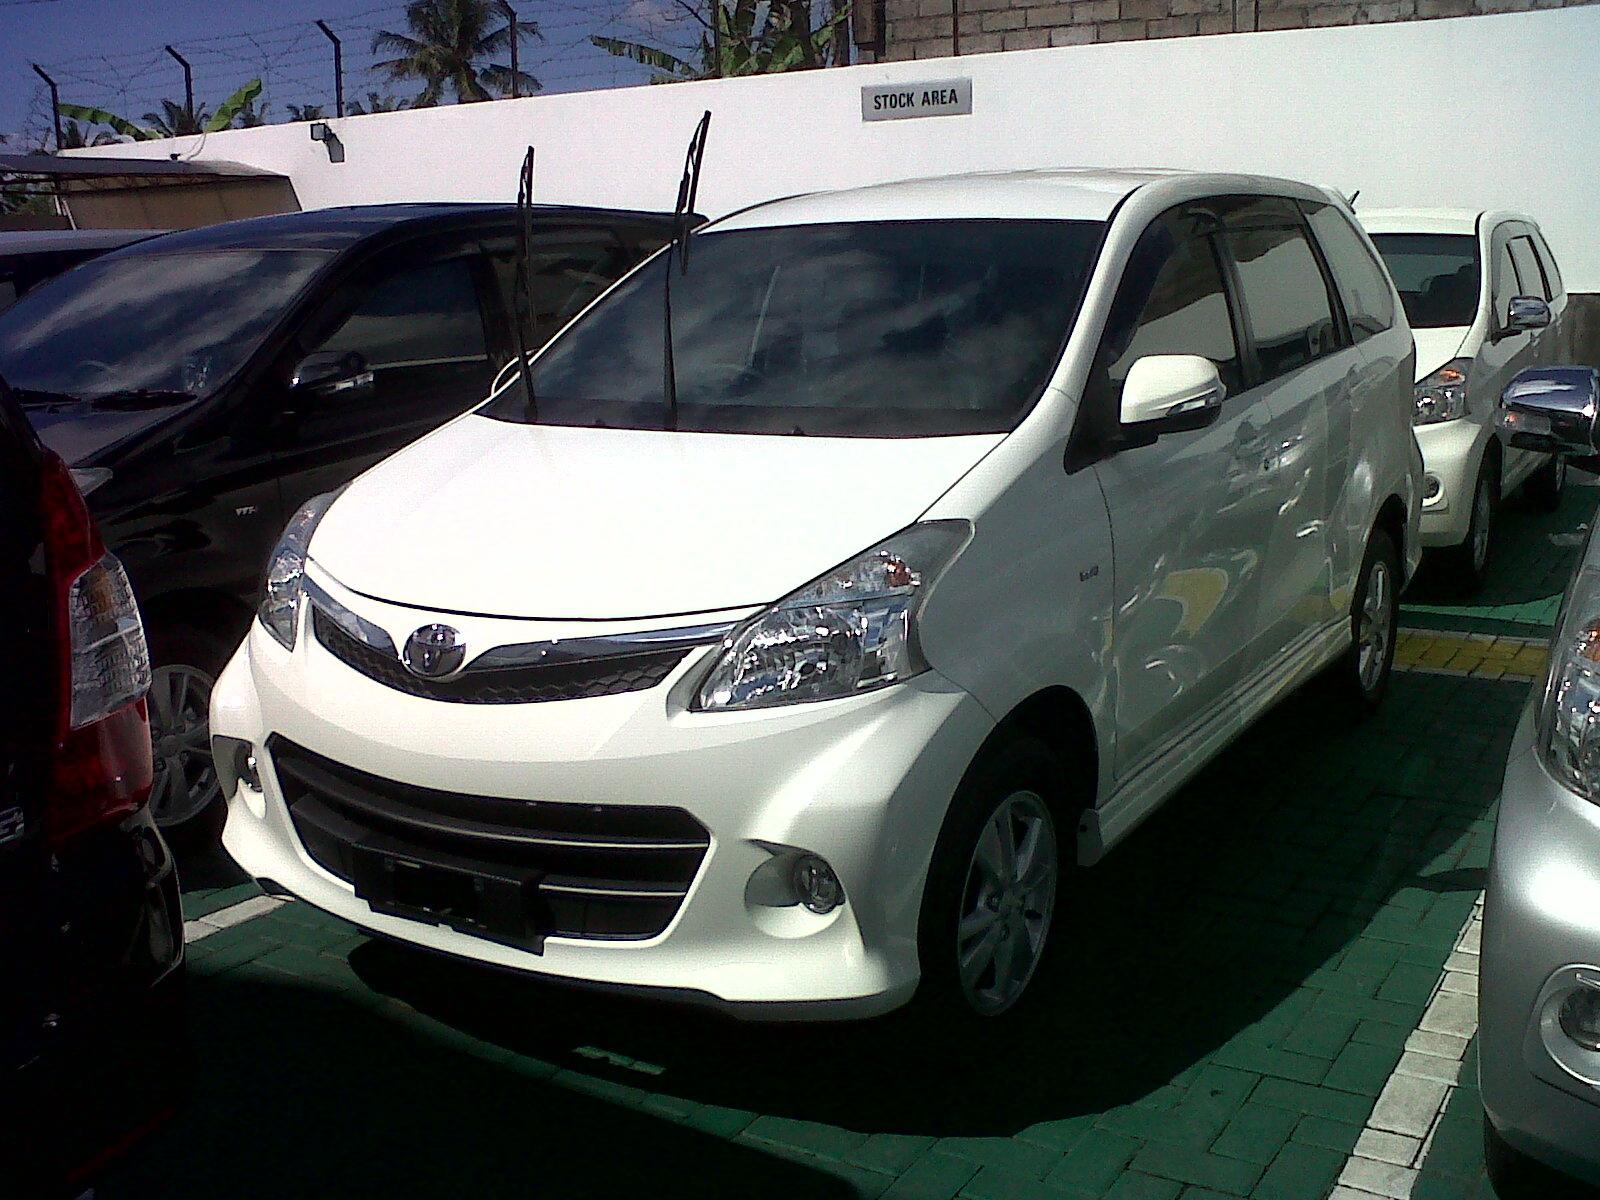 Konsumsi Bbm Grand New Veloz 1.5 Harga Avanza 2017 Surabaya Sales Toyota Agung Automall Bali Pt Automal Gianyar